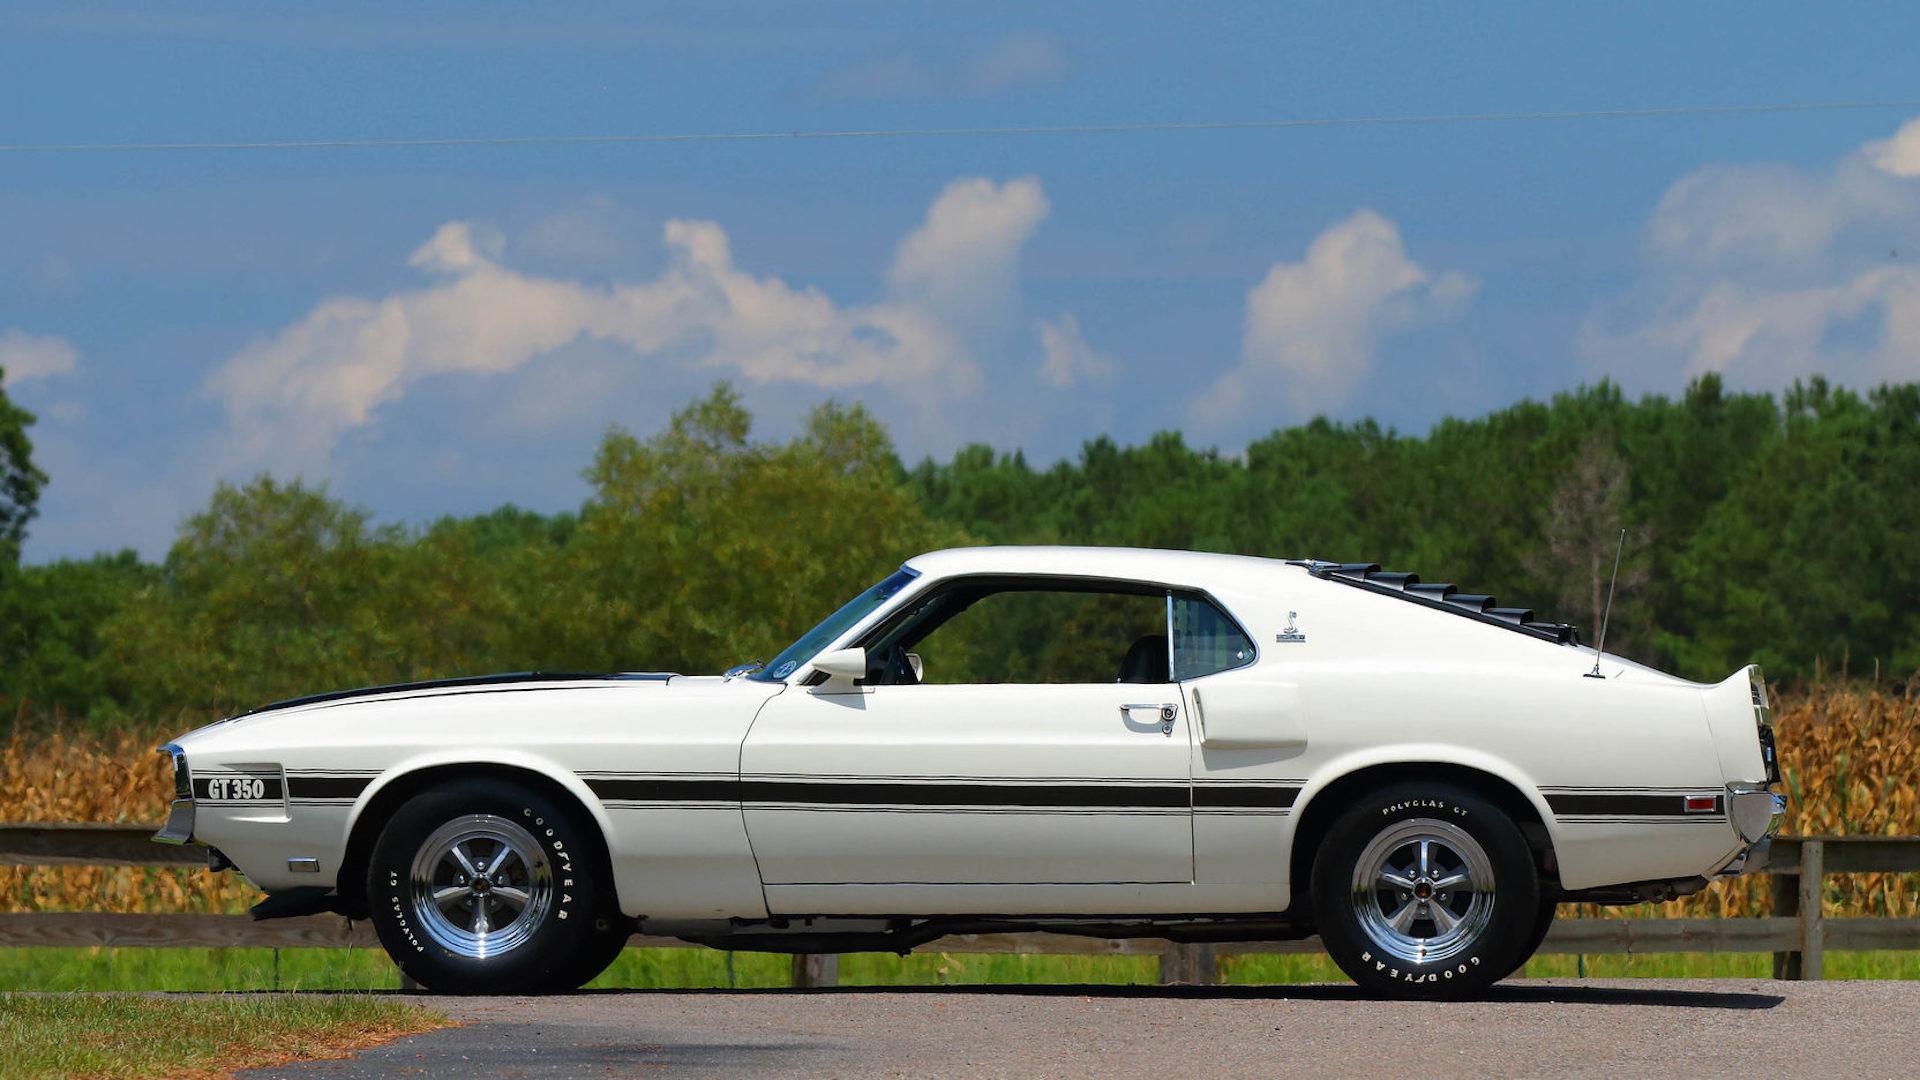 White 1970 GT350 Mustang